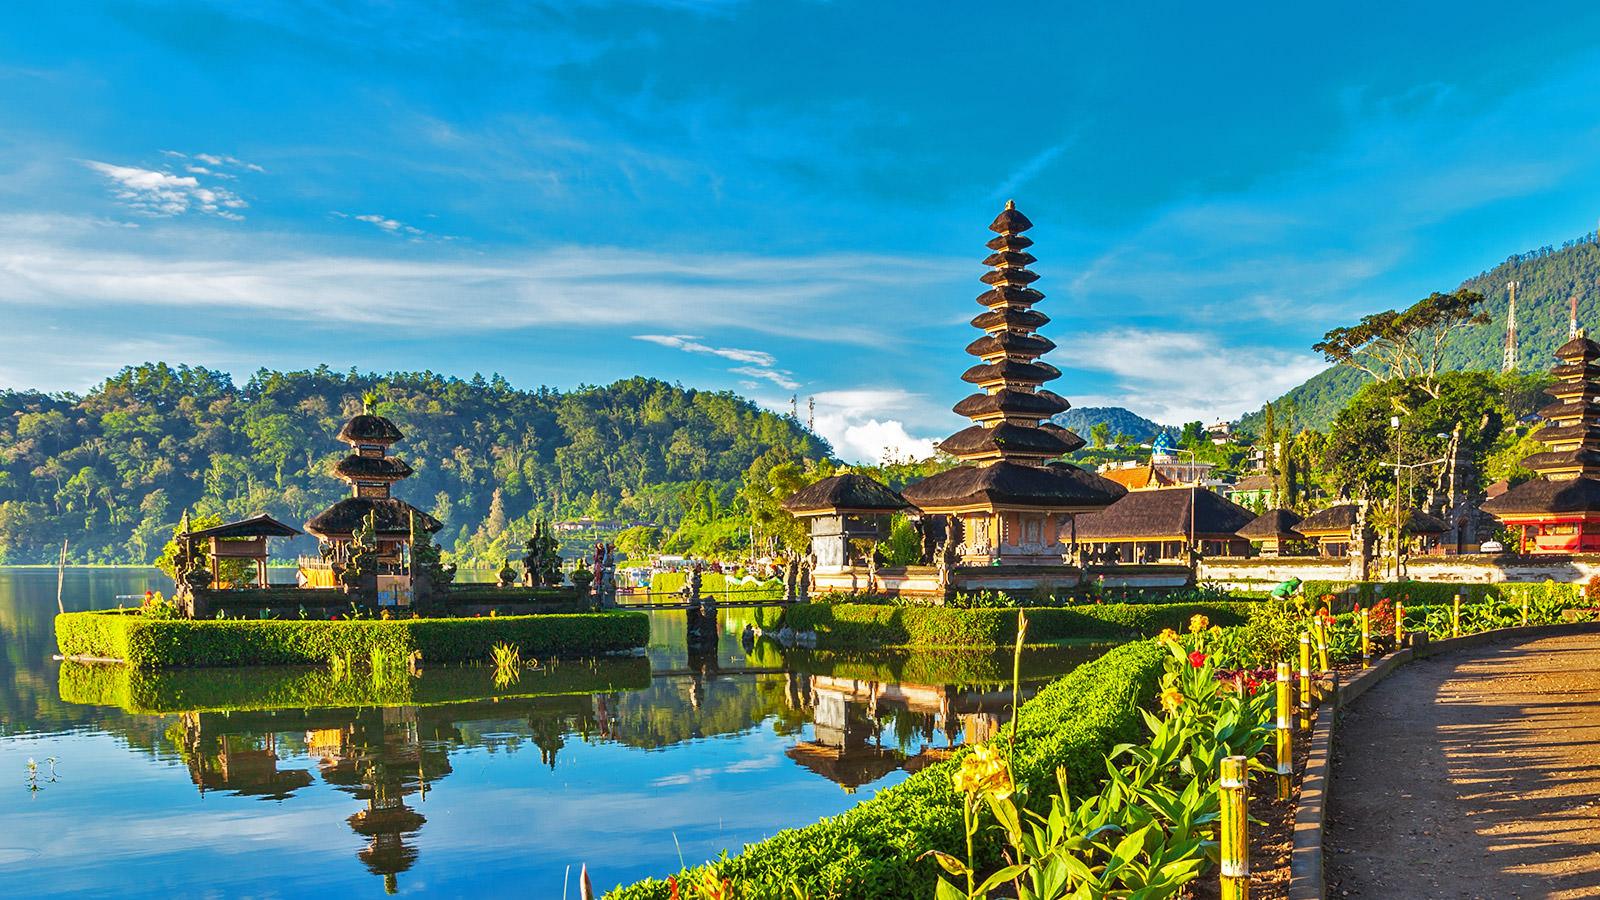 авиаперевозки в индонезию